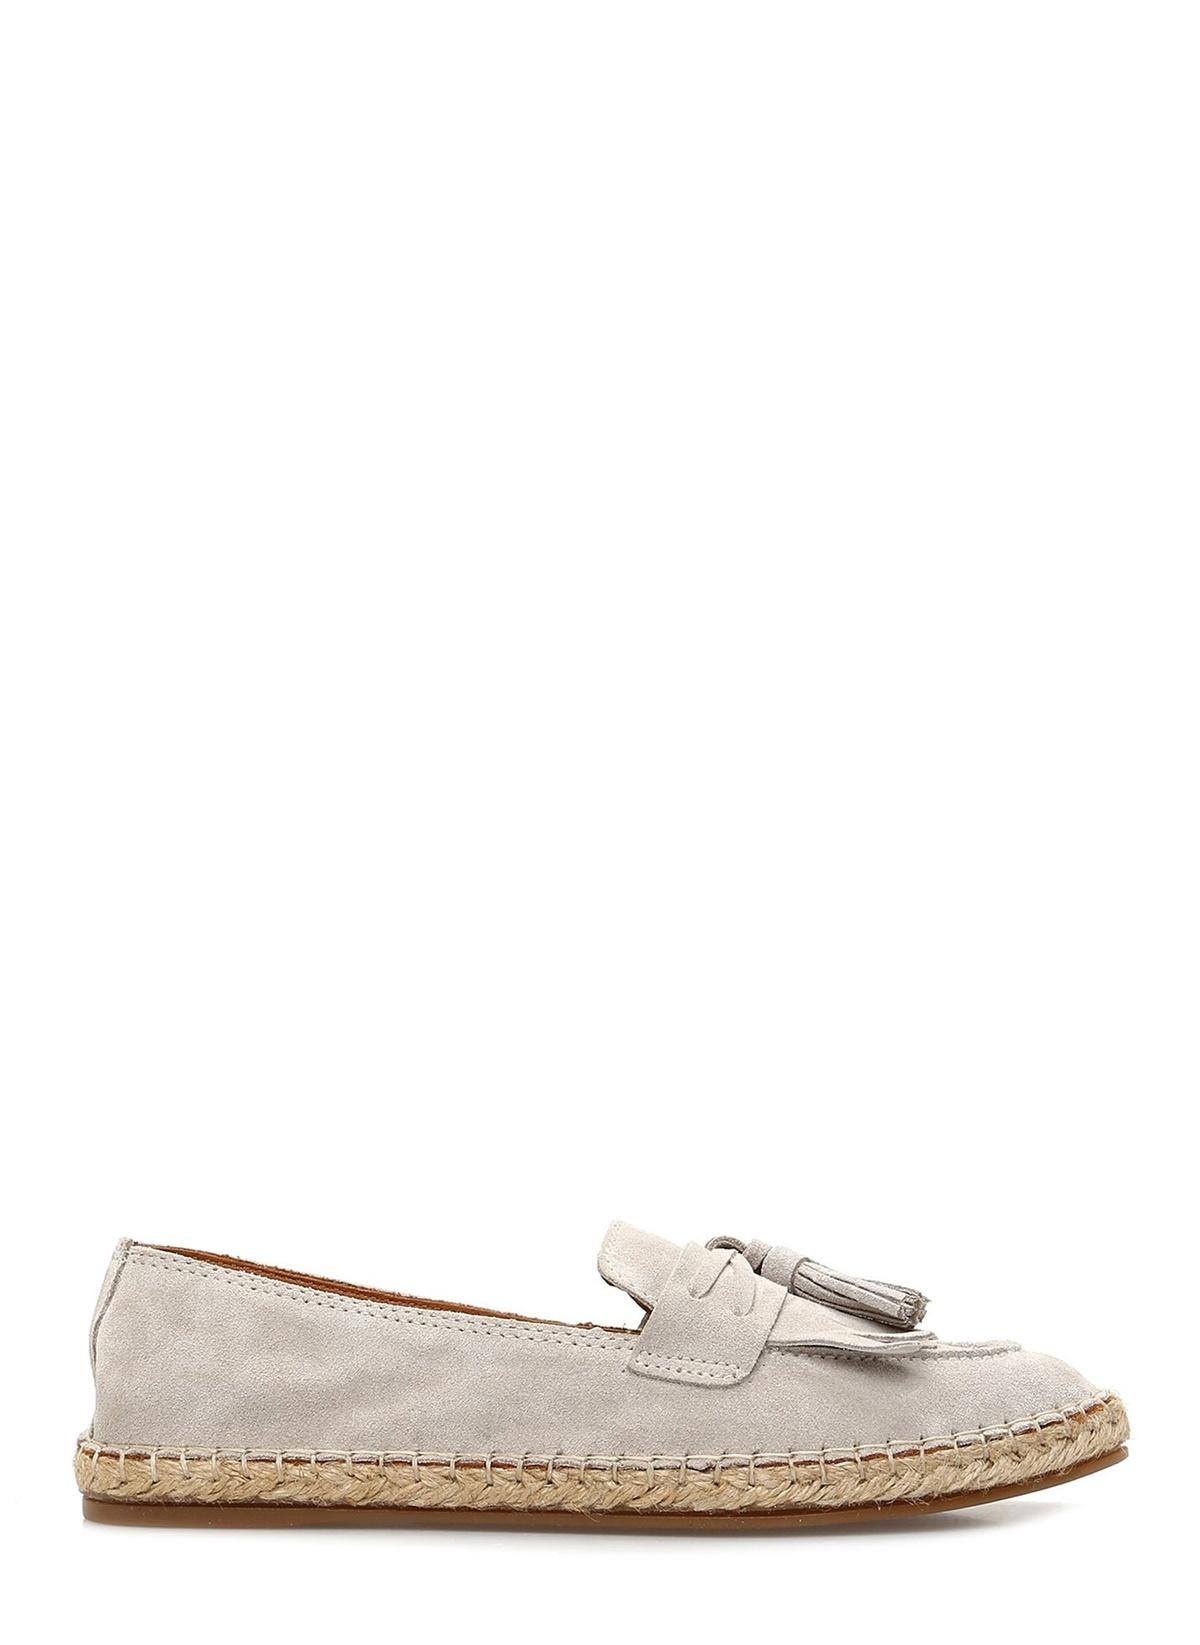 Divarese Ayakkabı 5023011-k-loafer – 349.0 TL